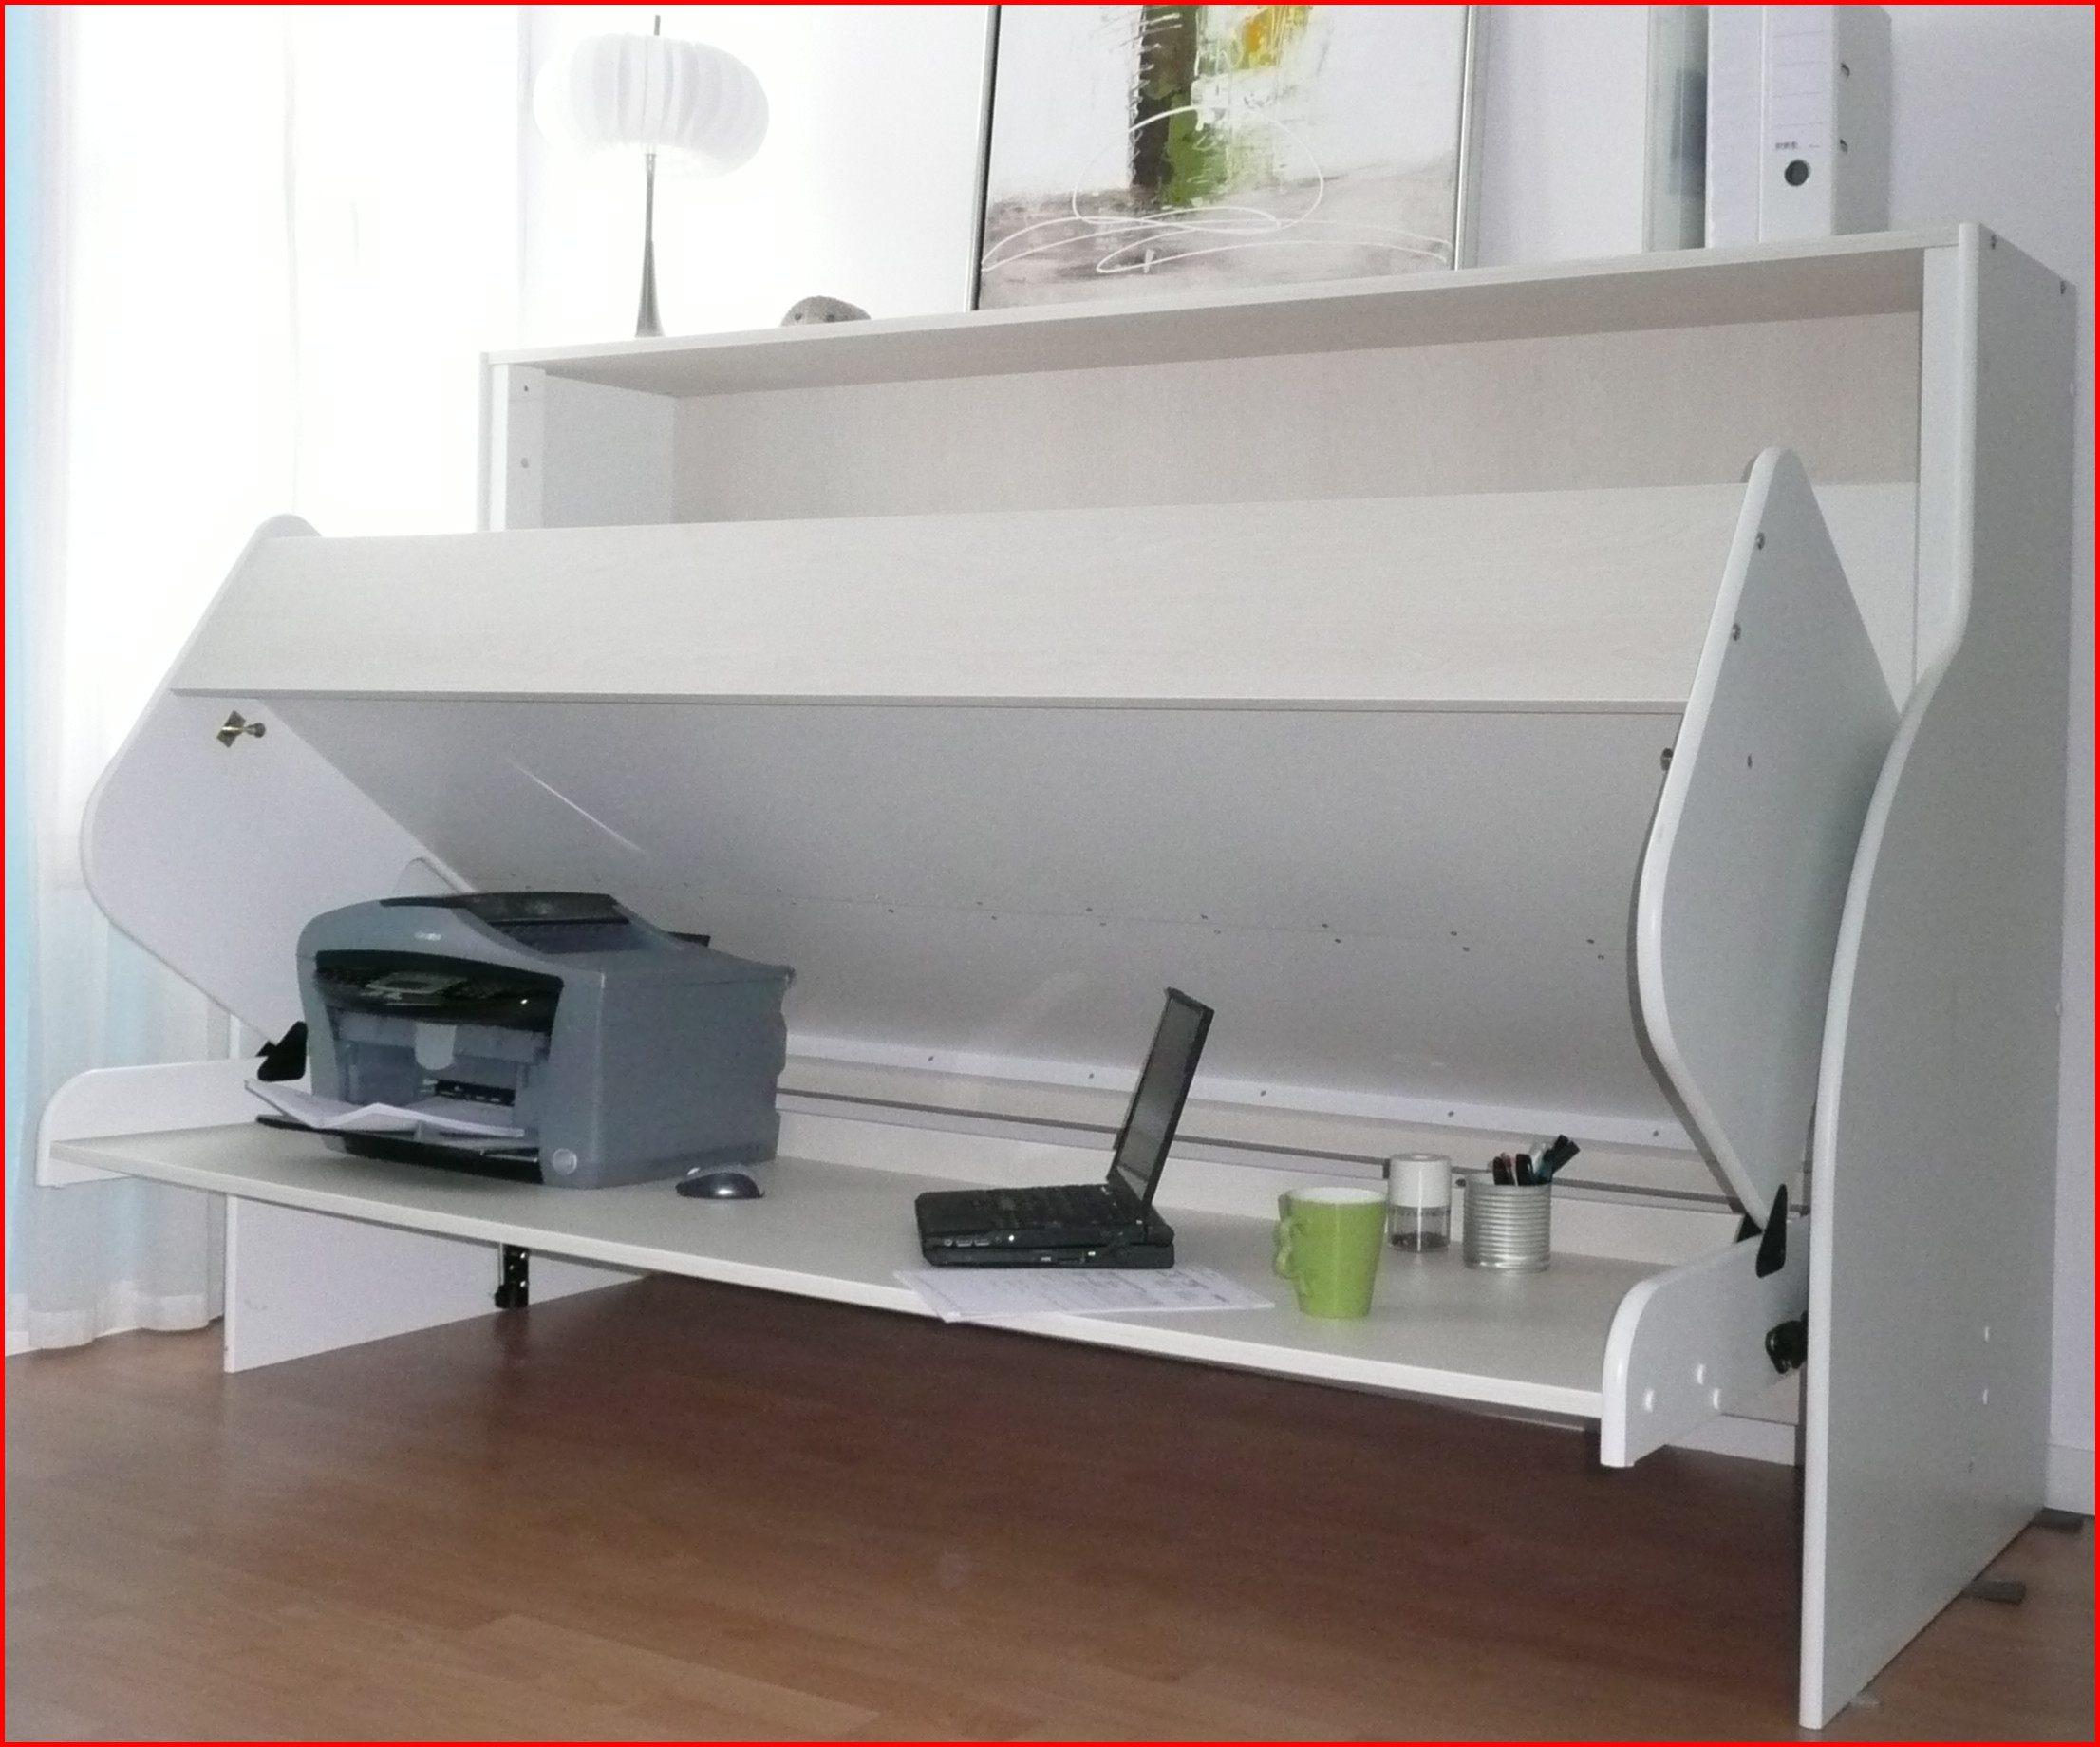 Lit Superposé Rabattable Meilleur De Lit Mezzanine Bureau Armoire Lit Bureau Escamotable Bureau